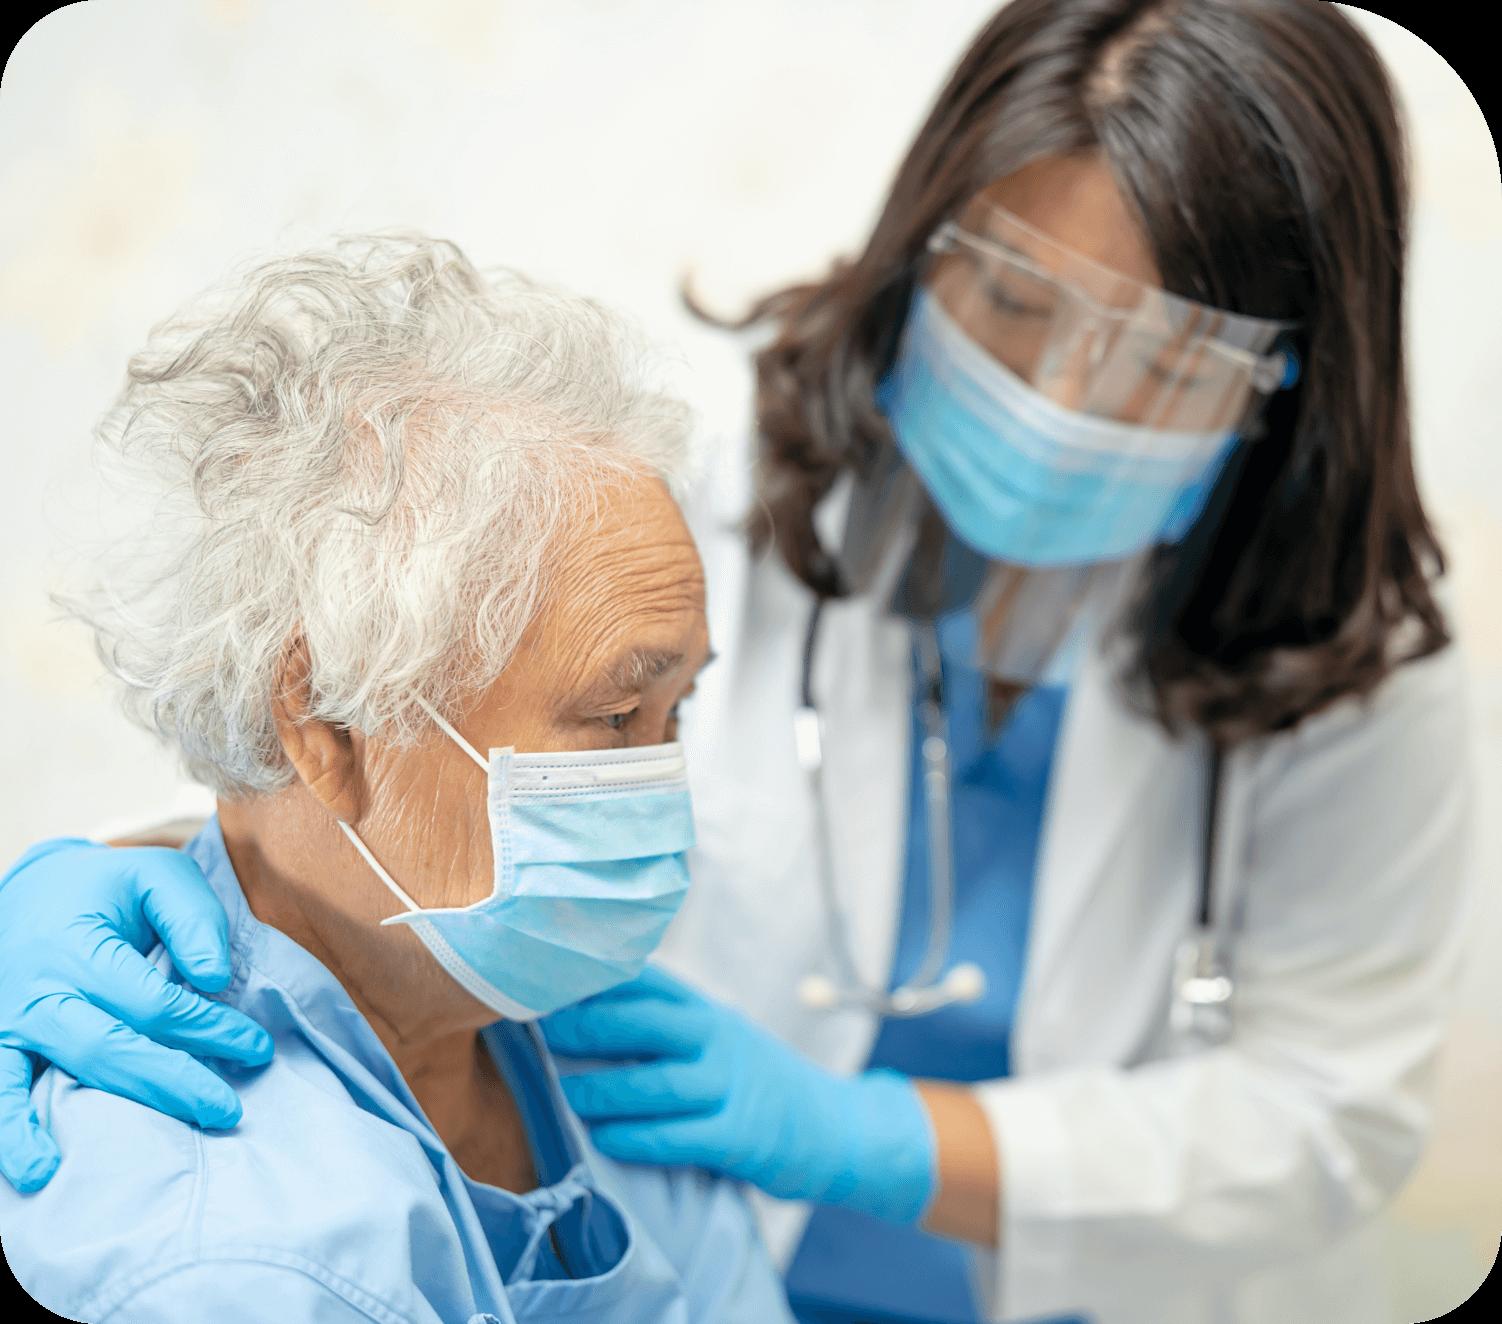 Eliminate healthcare vendor img